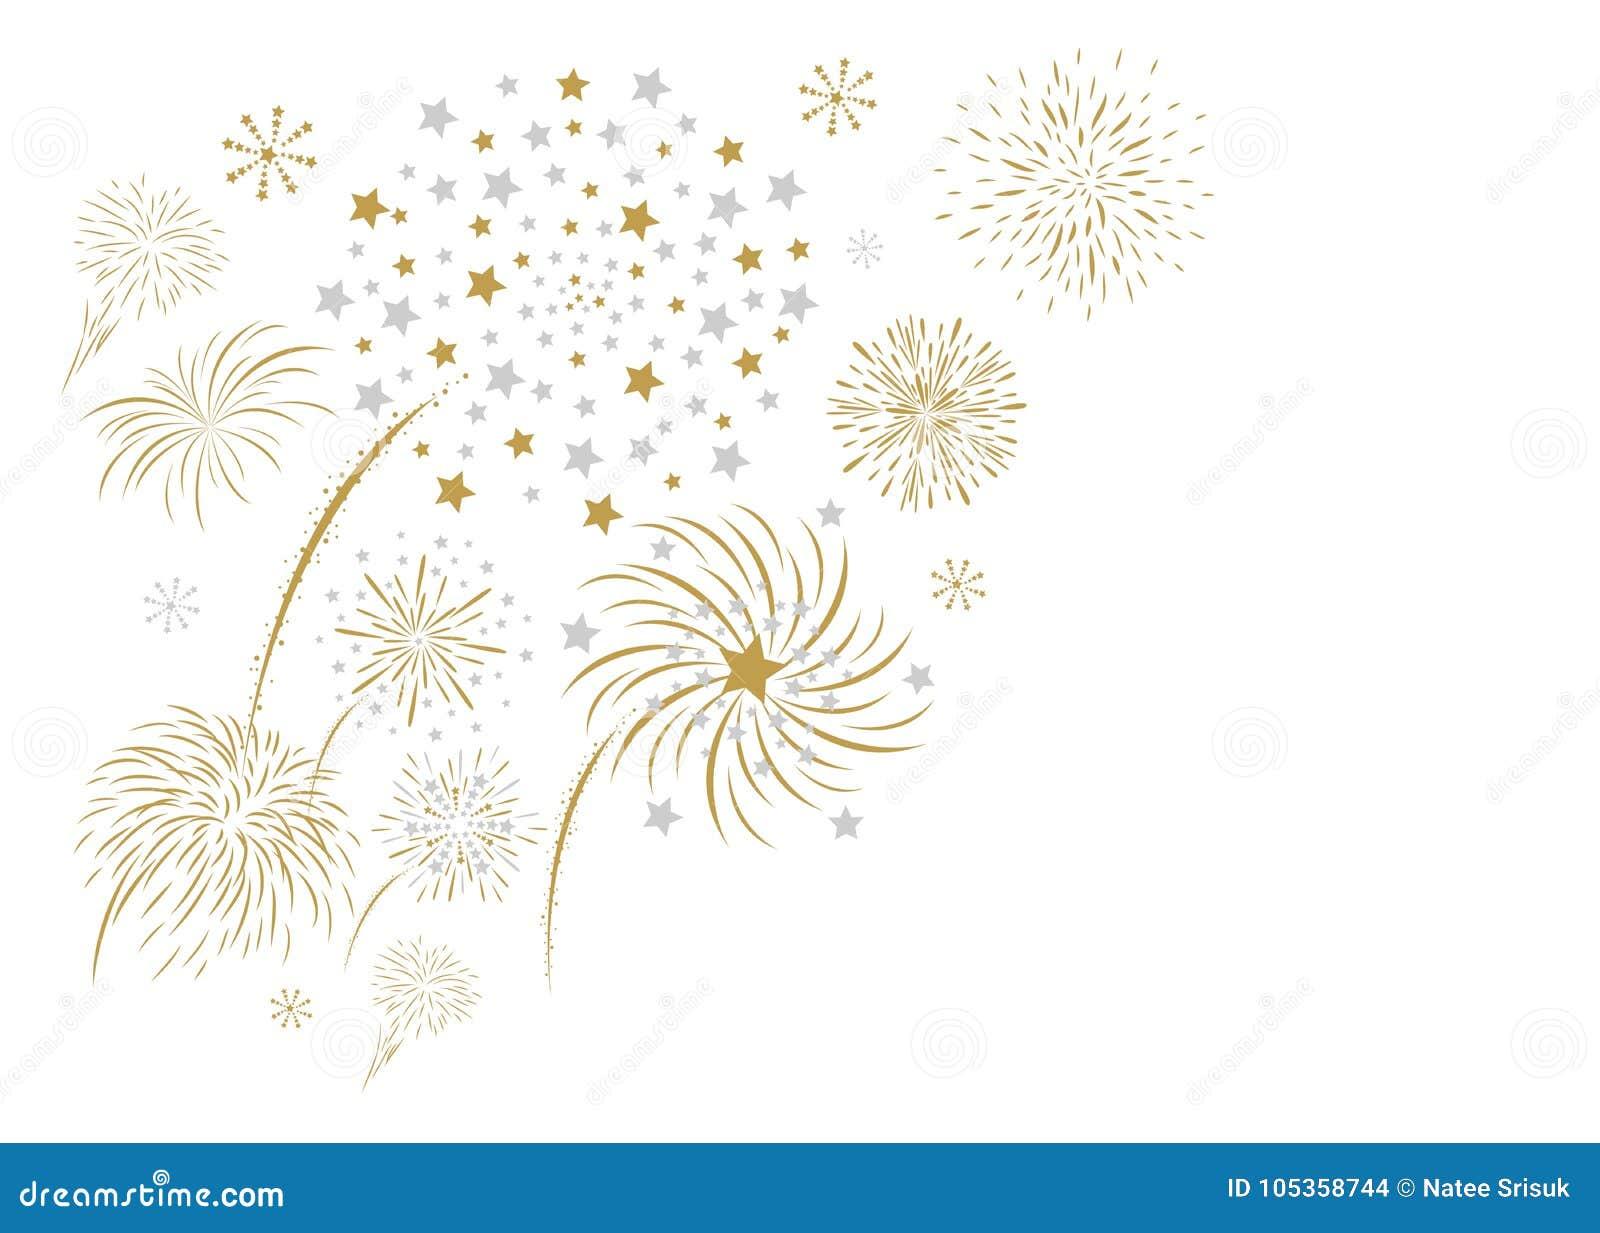 Fireworks design isolated on white background